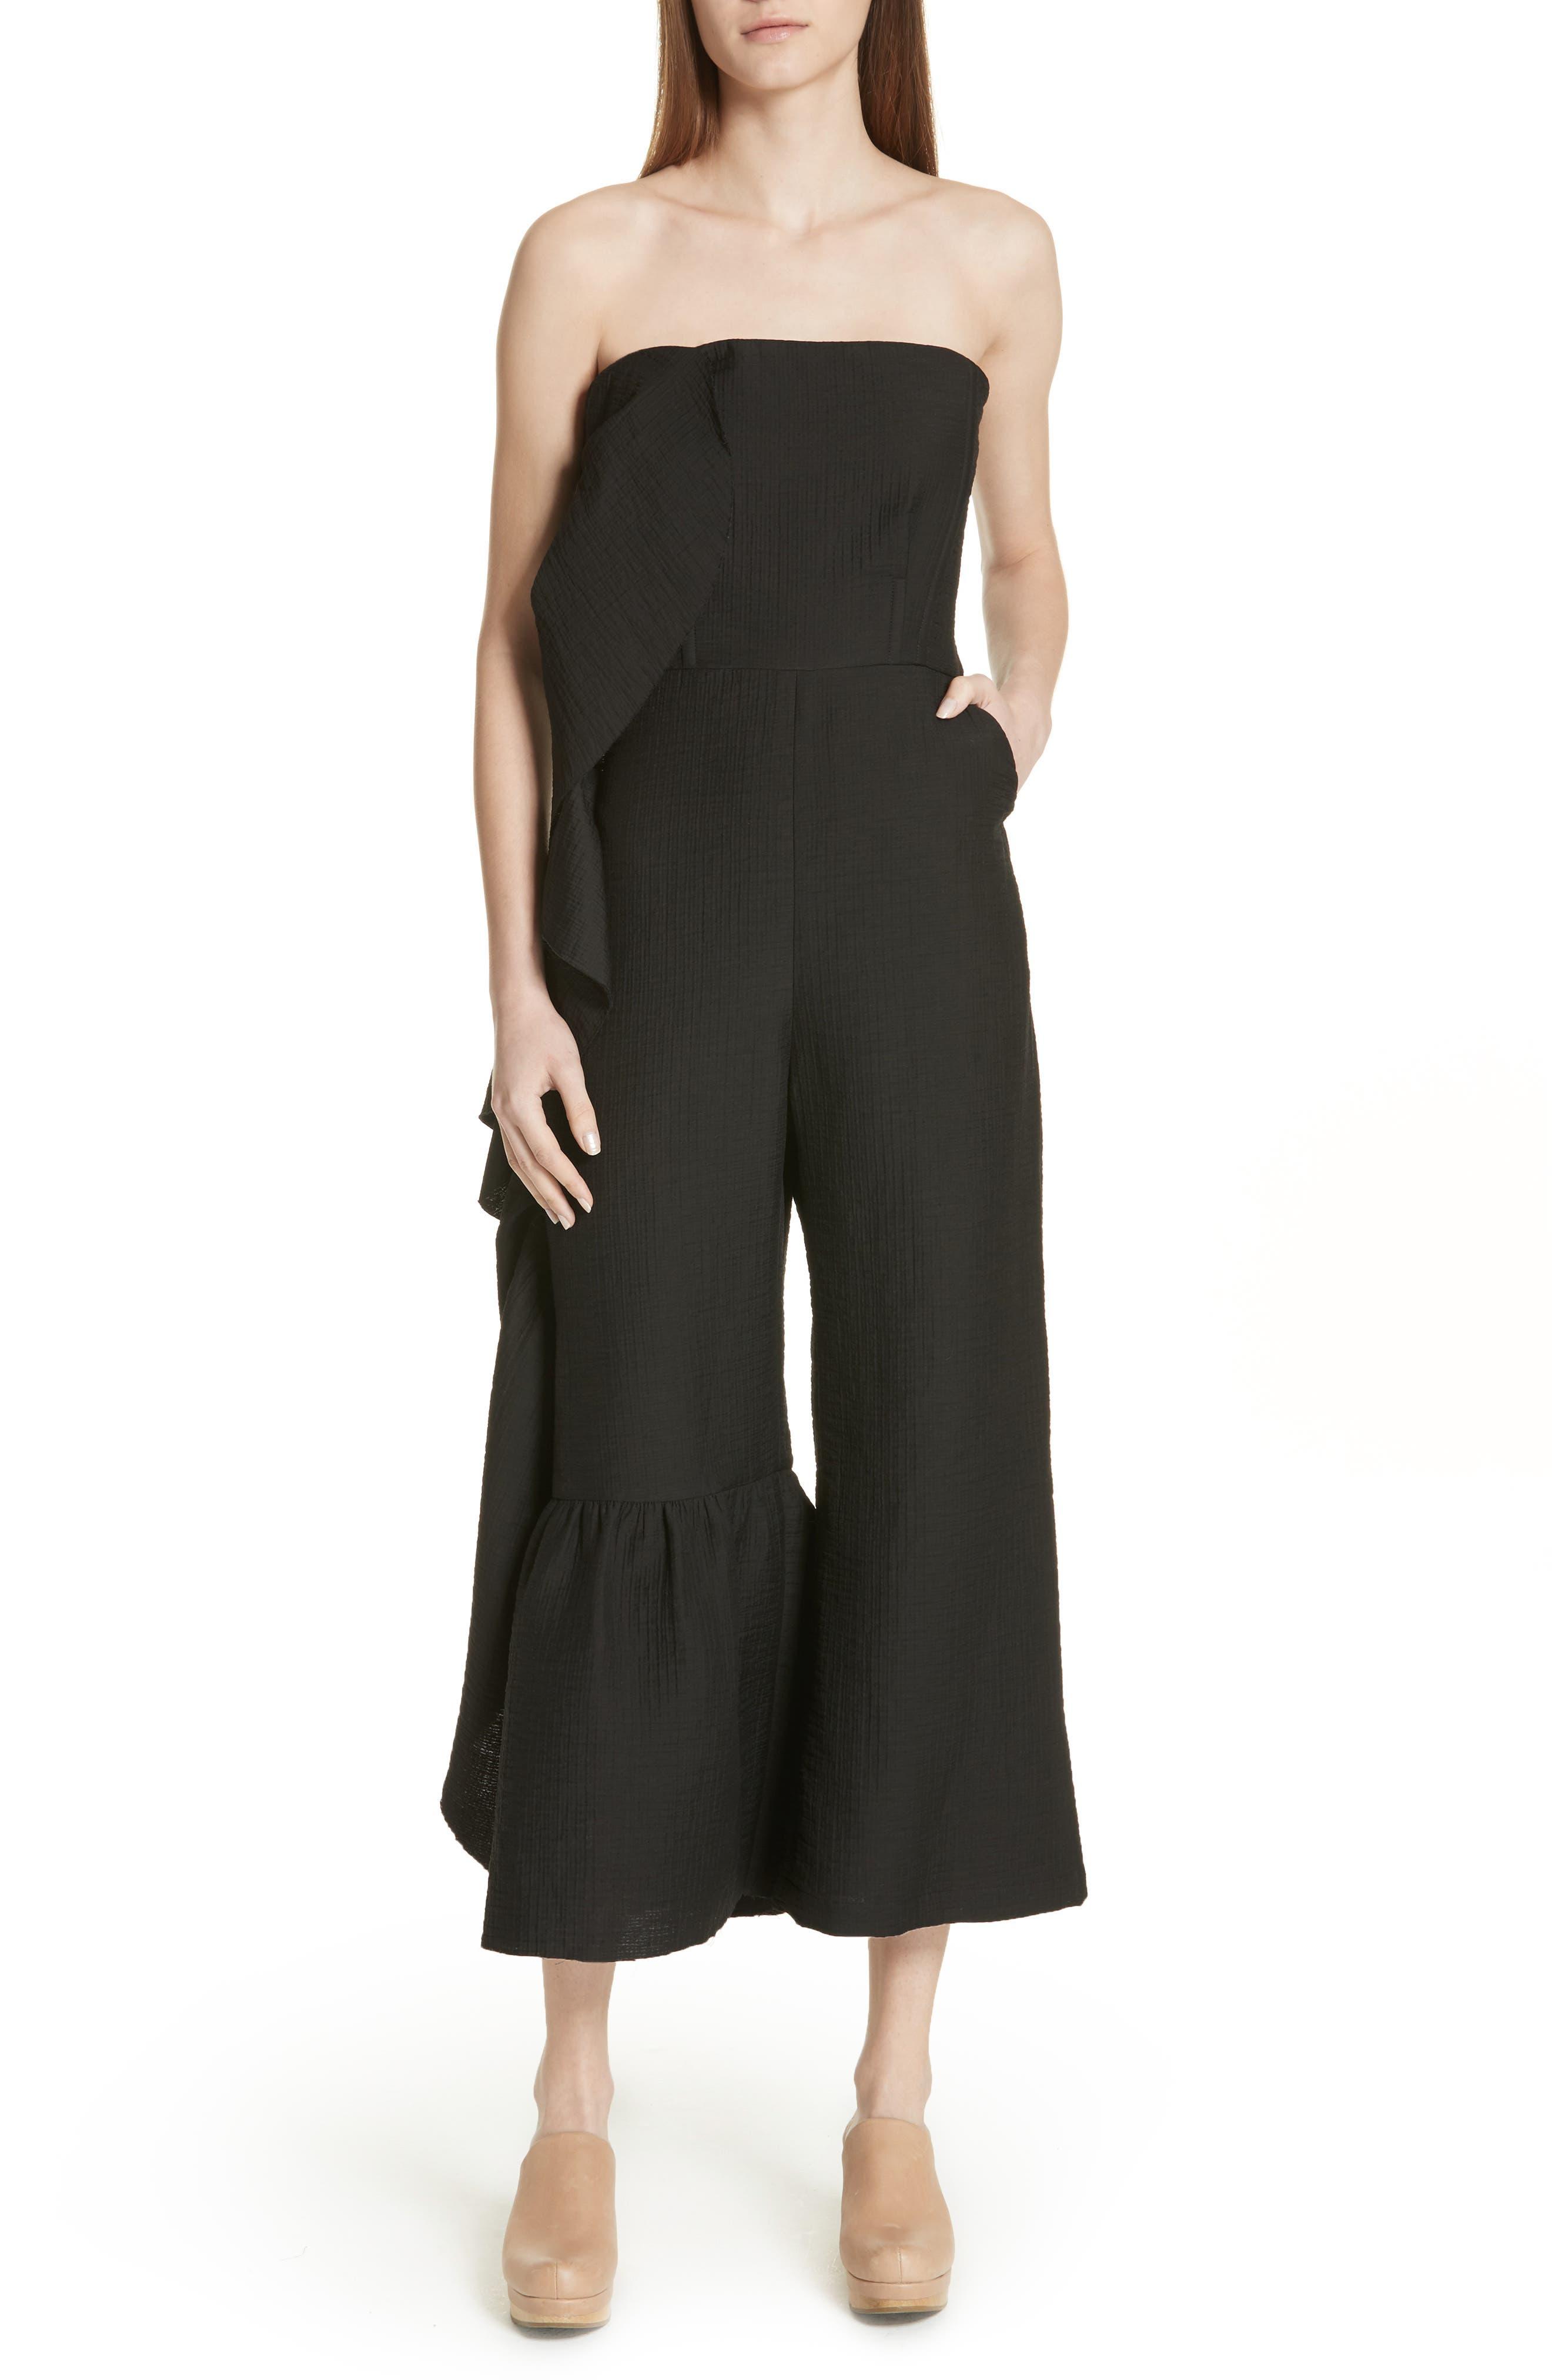 Alternate Image 1 Selected - Rachel Comey Revel Strapless Jumpsuit